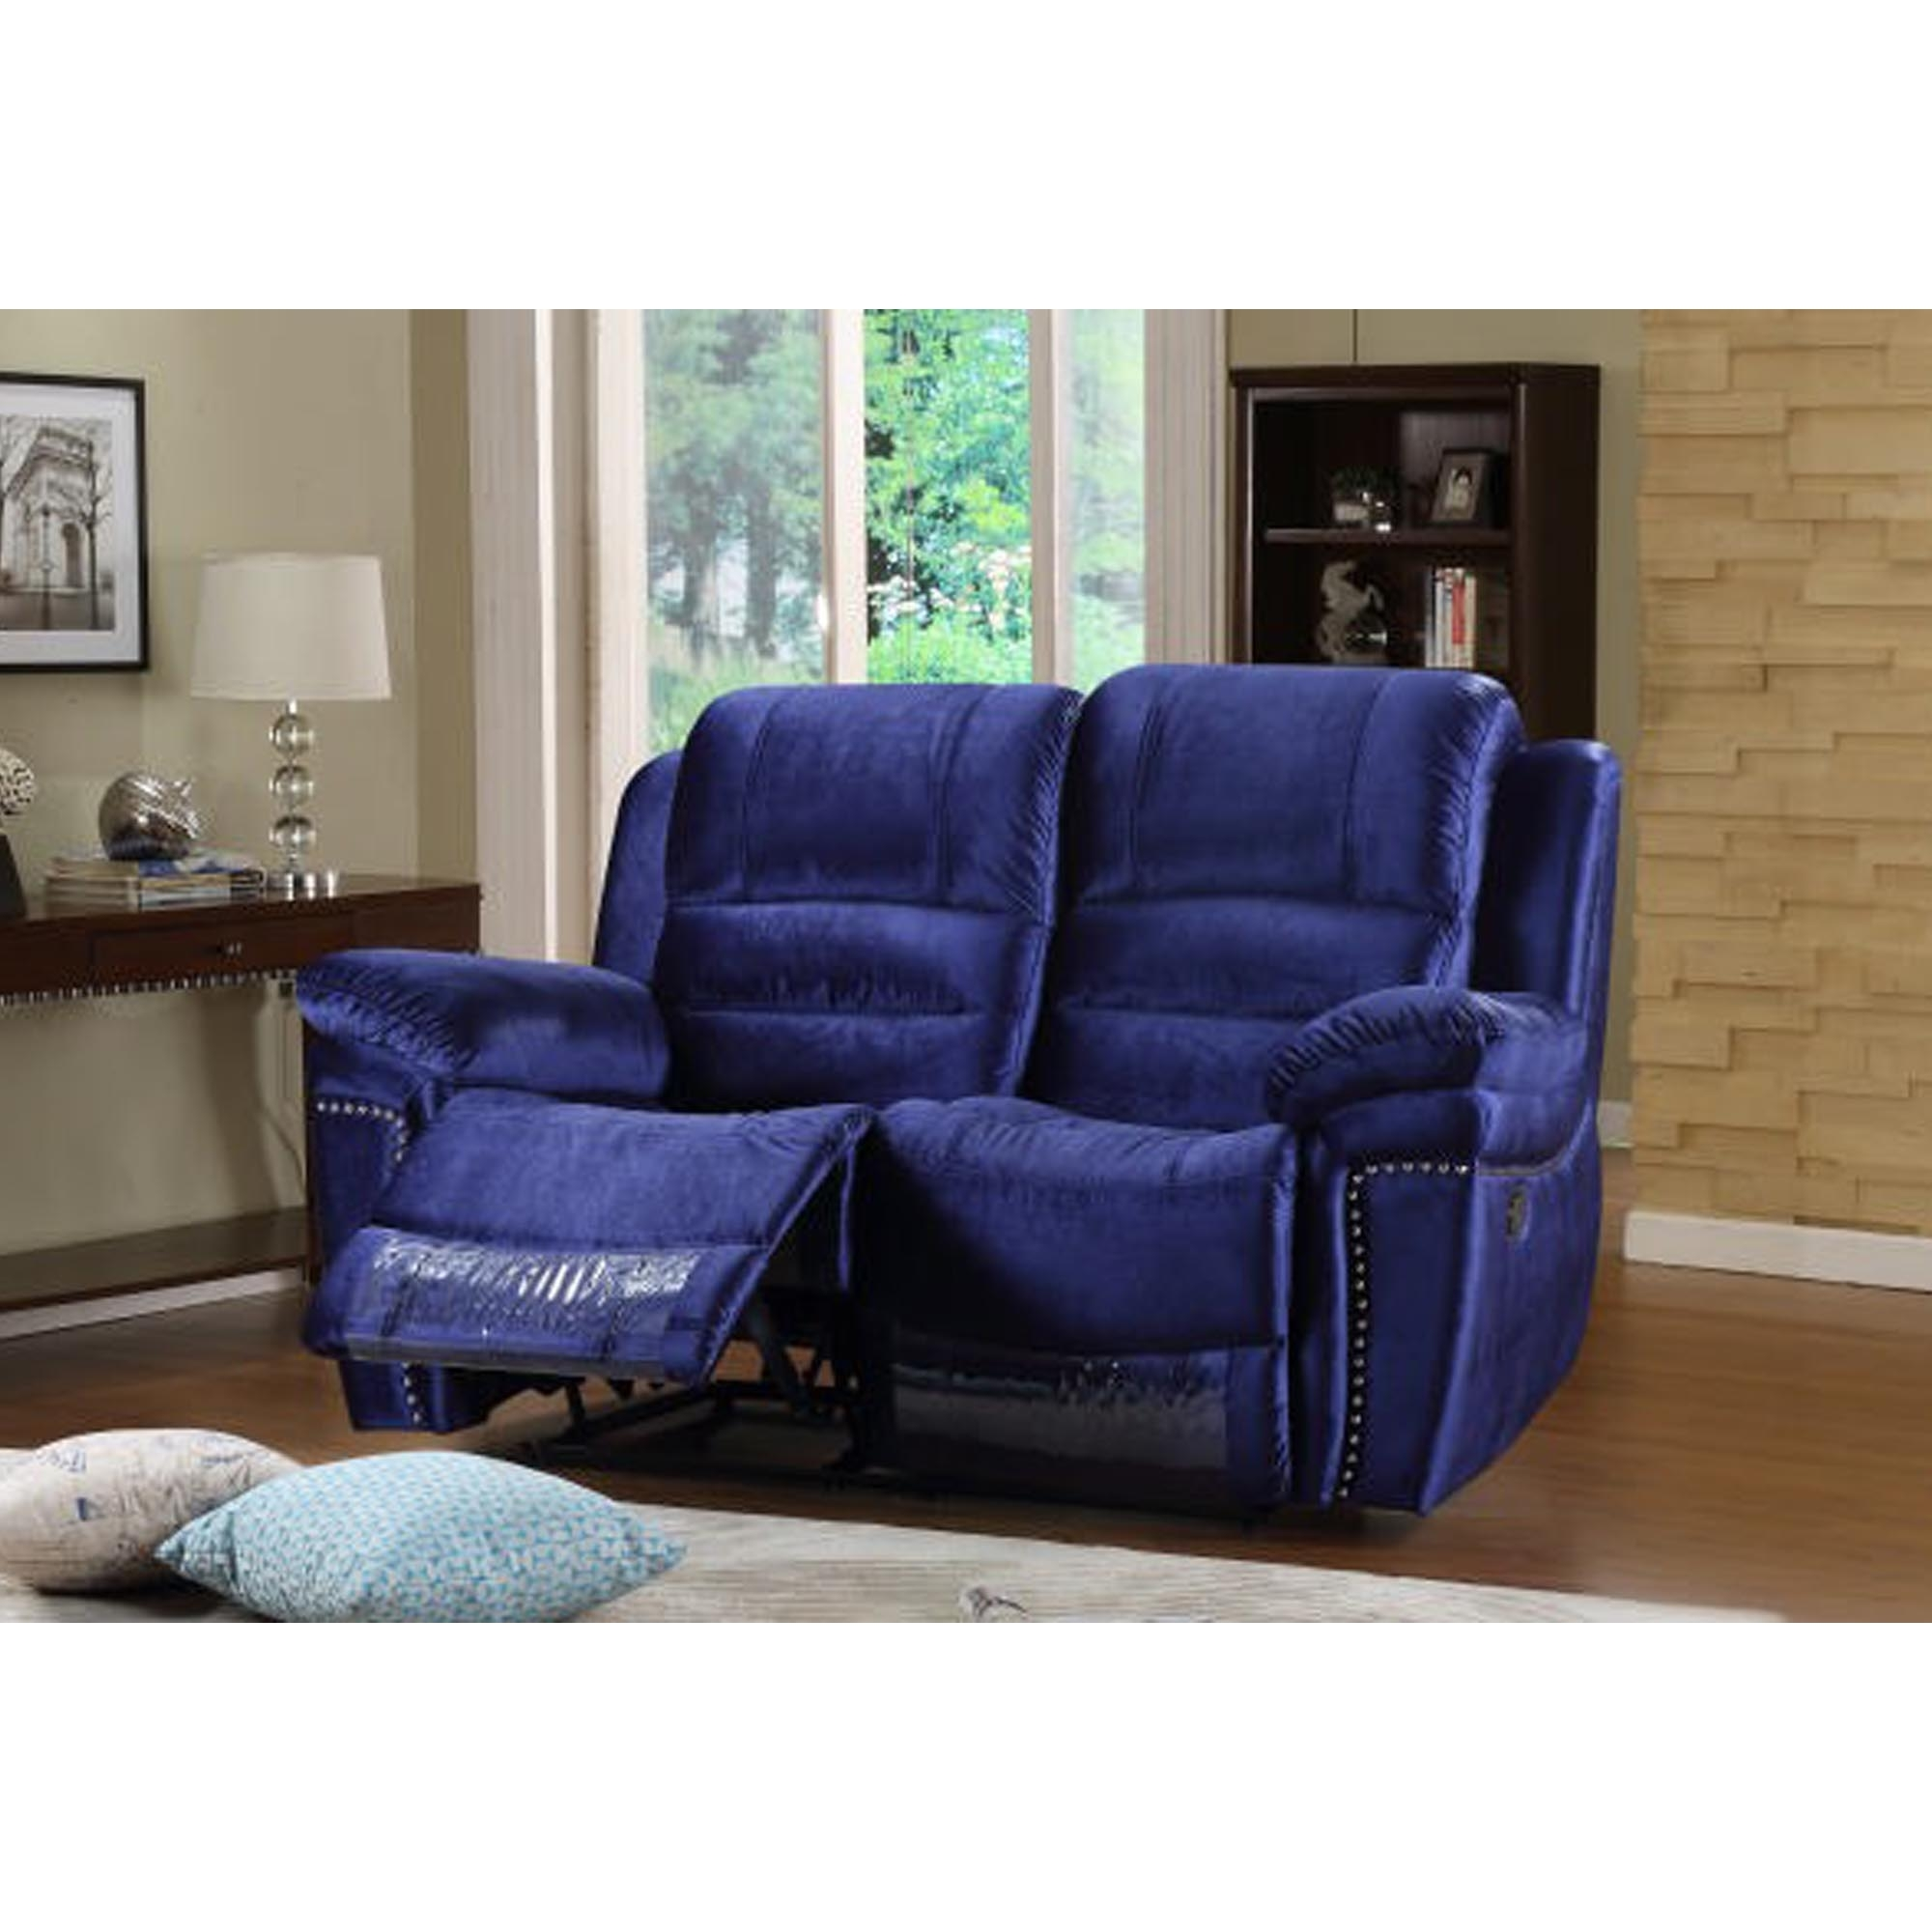 Claton 2 Seater Royal Blue Sofa